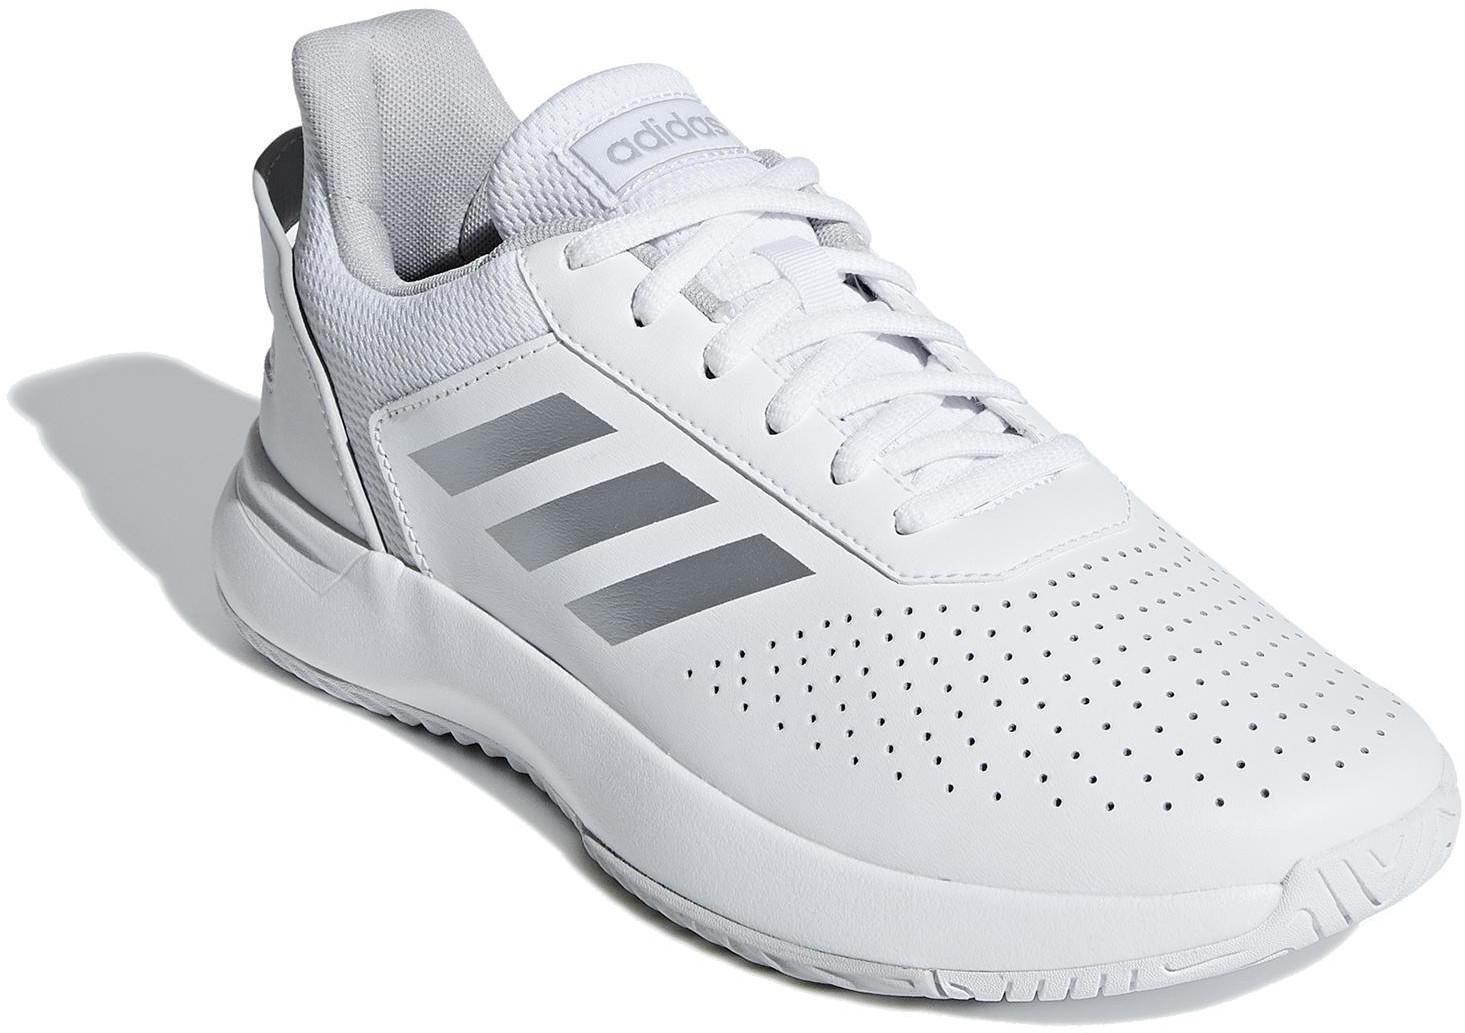 Adidas Buty Tenis Courtsmash Damskie female